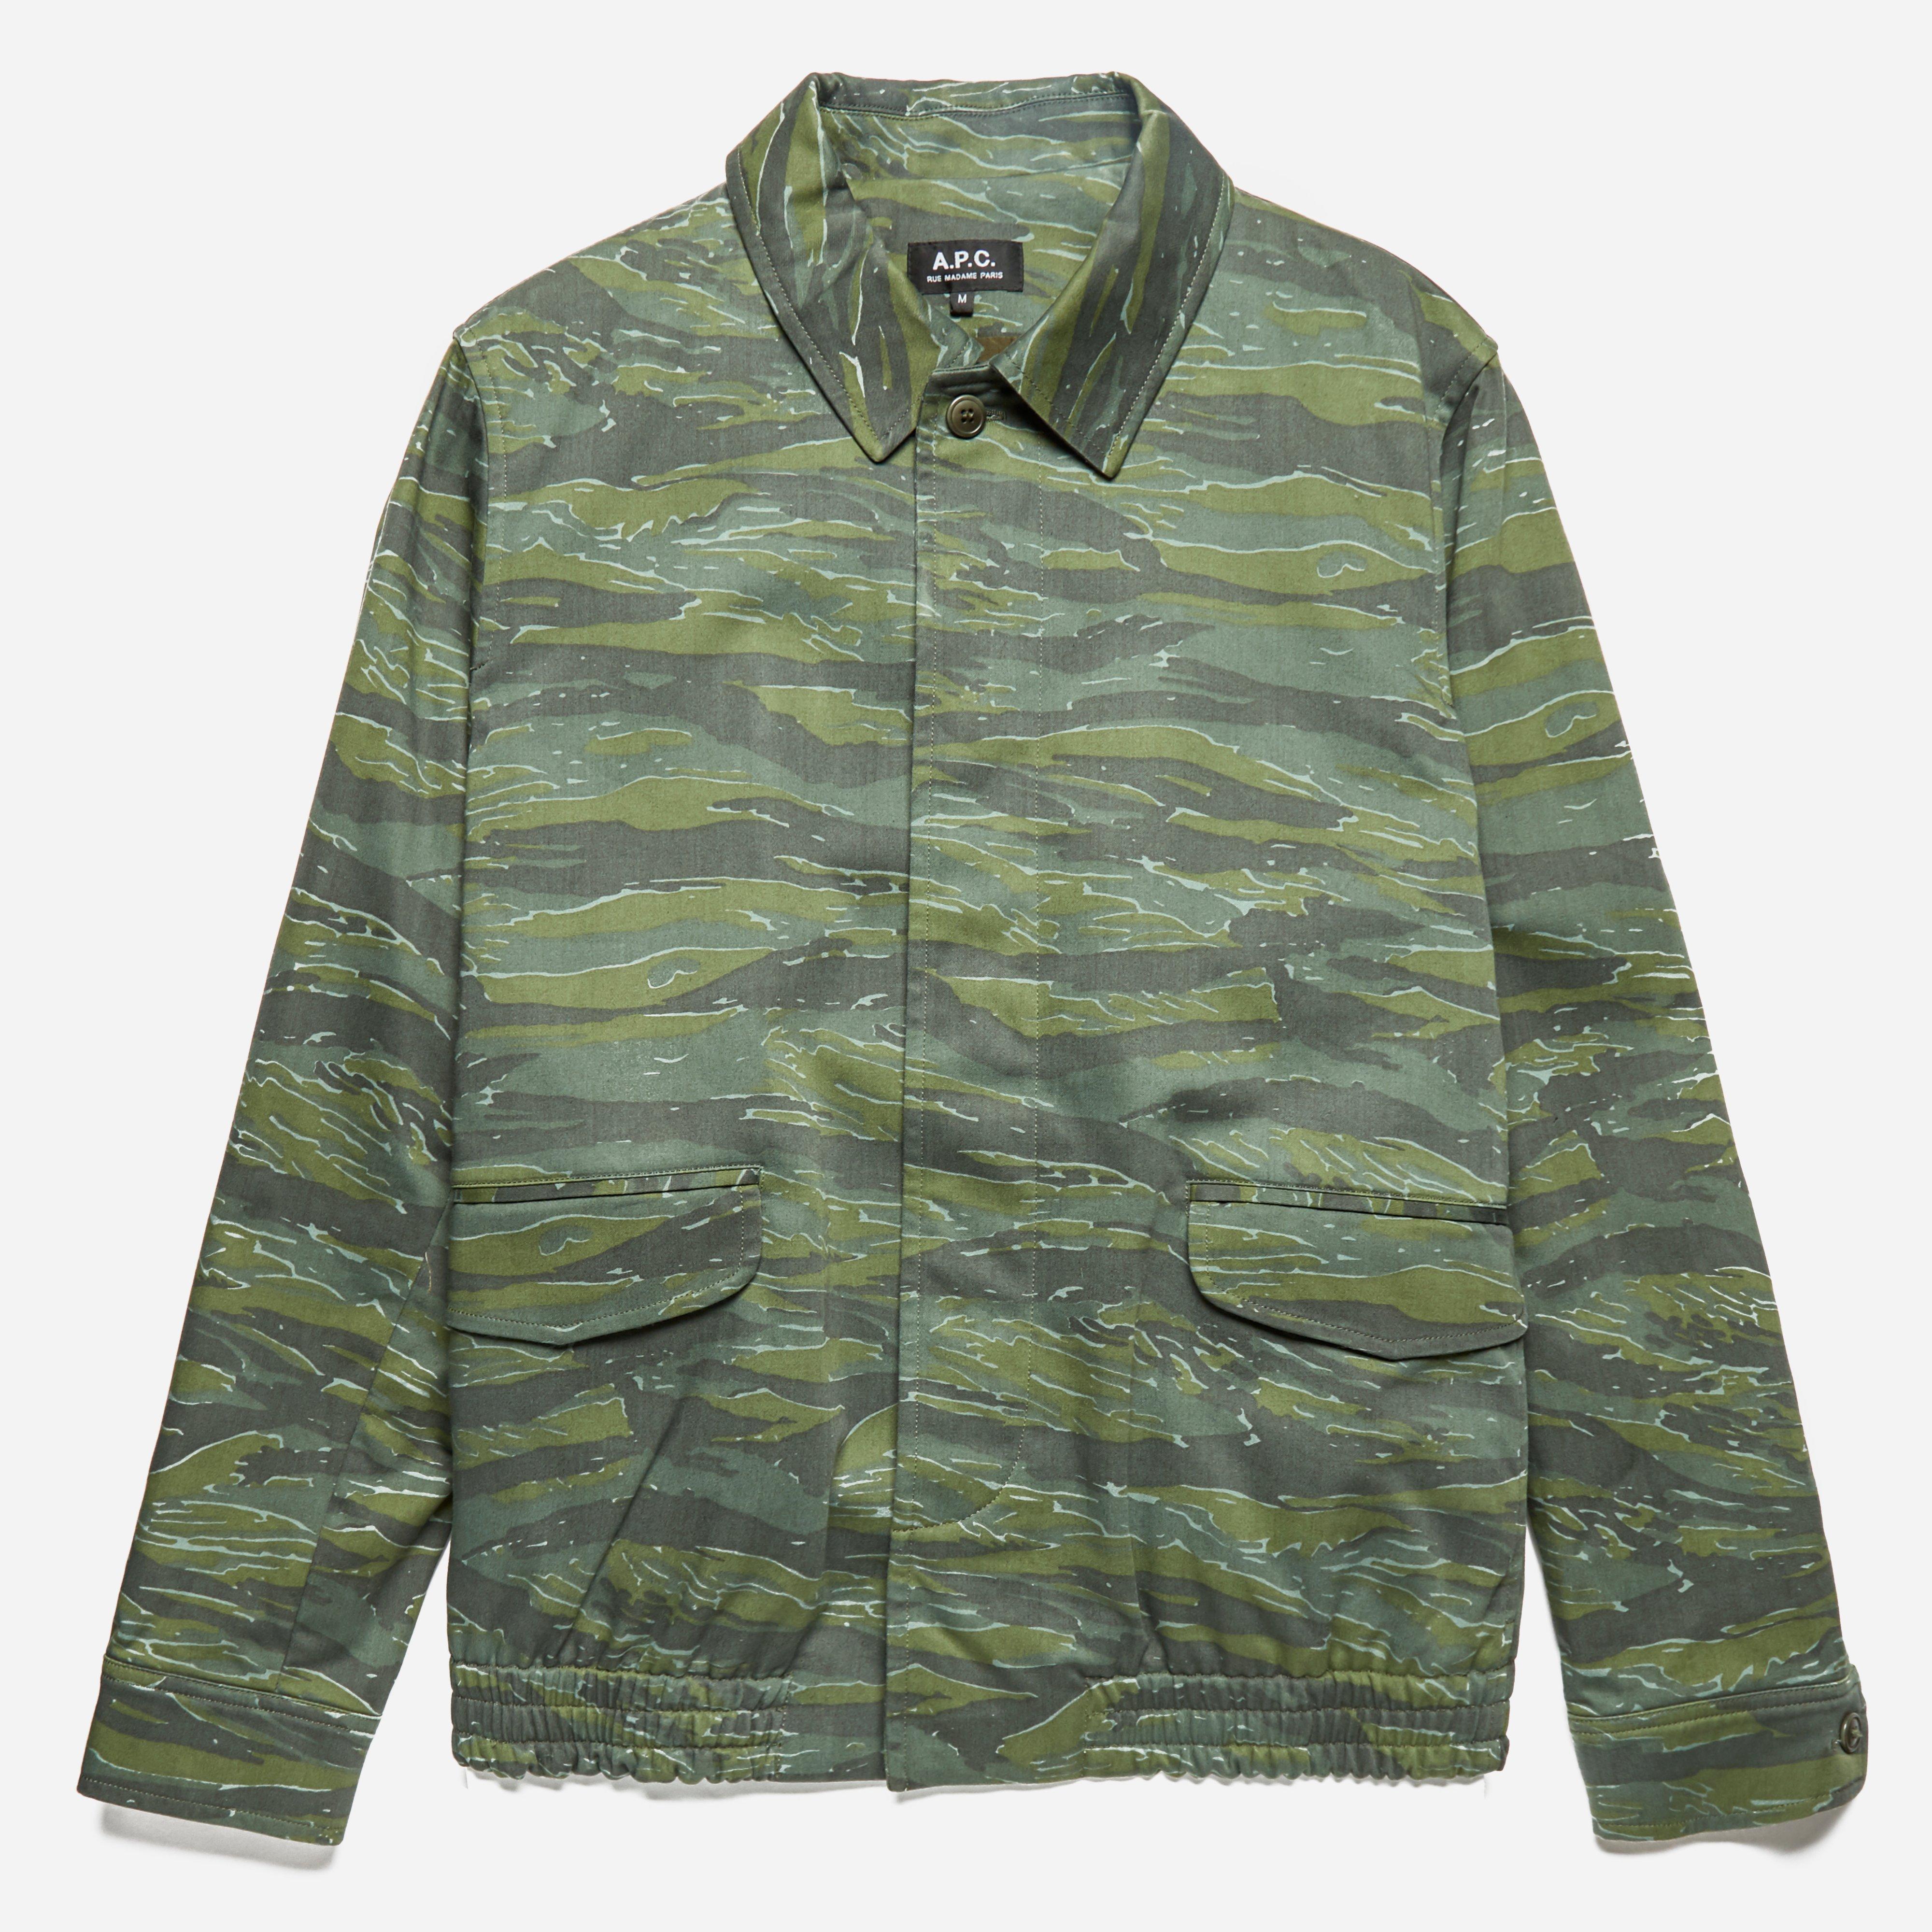 A.P.C Camouflage Blouson Green